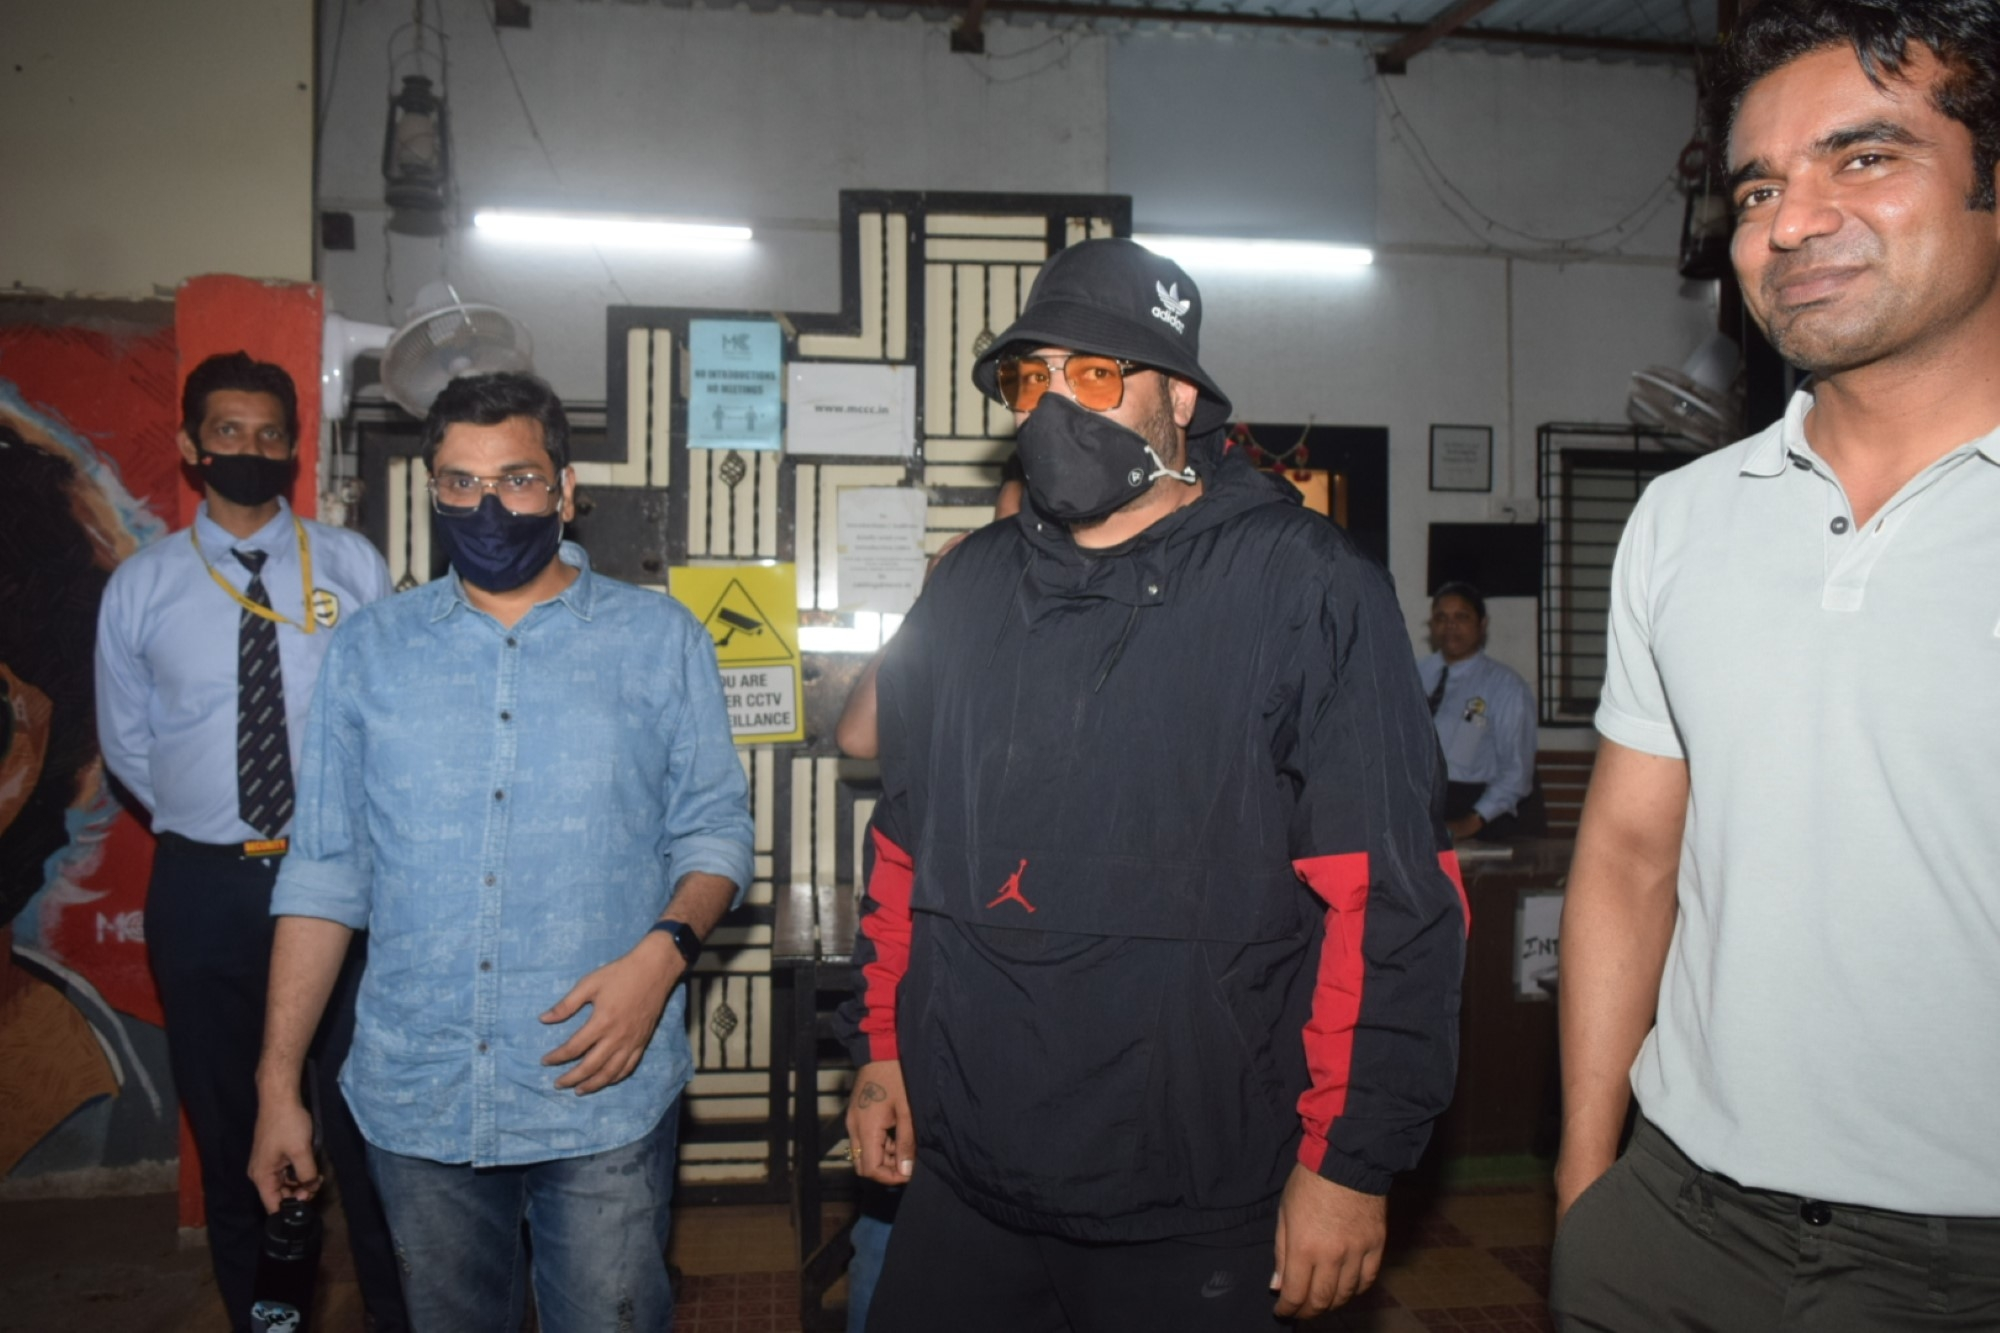 Badshah & Mukesh Chhabra Spotted At Mukesh Chhabra Office In Andheri